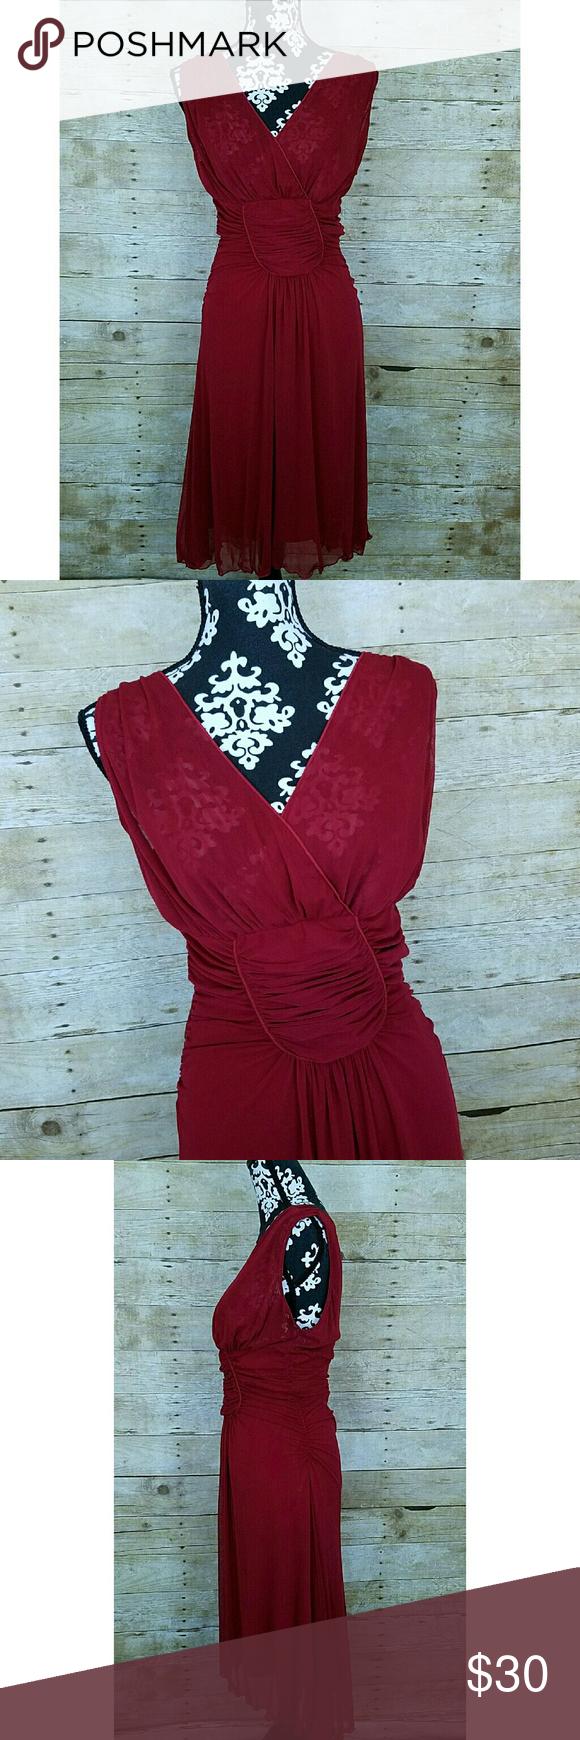 "NWT Studio M Dress Women's Studio M Dress  Sleeveless  Sheer at bust  Sheer overlay with lining  Red  Size Medium  NWT: Retail price: $118   Measurements laying flat:  Underarm to underarm: 17""  Length: 49"" Studio M Dresses"